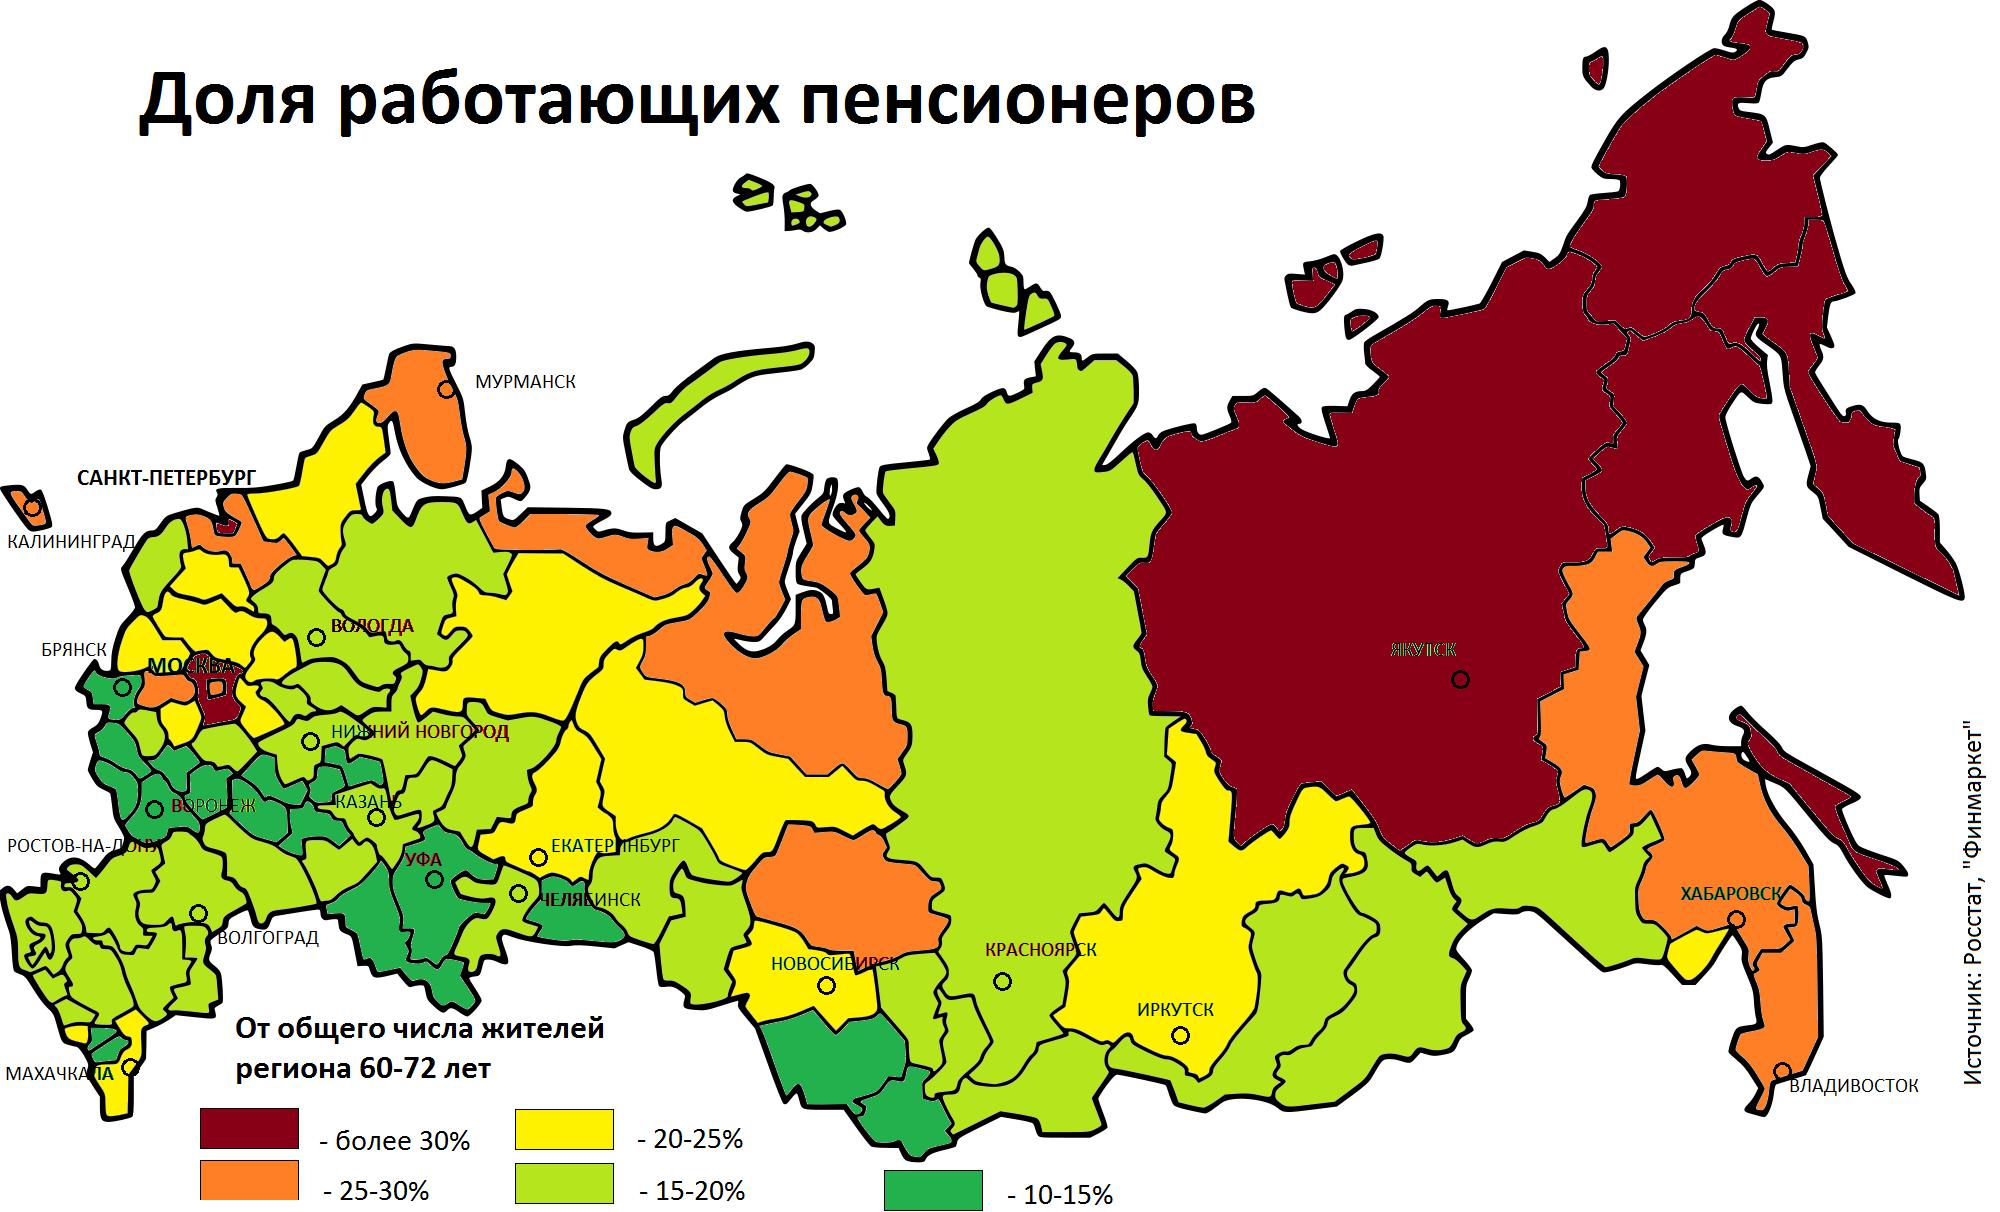 http://fmimg.finmarket.ru/FMCharts/180313/pens1.png